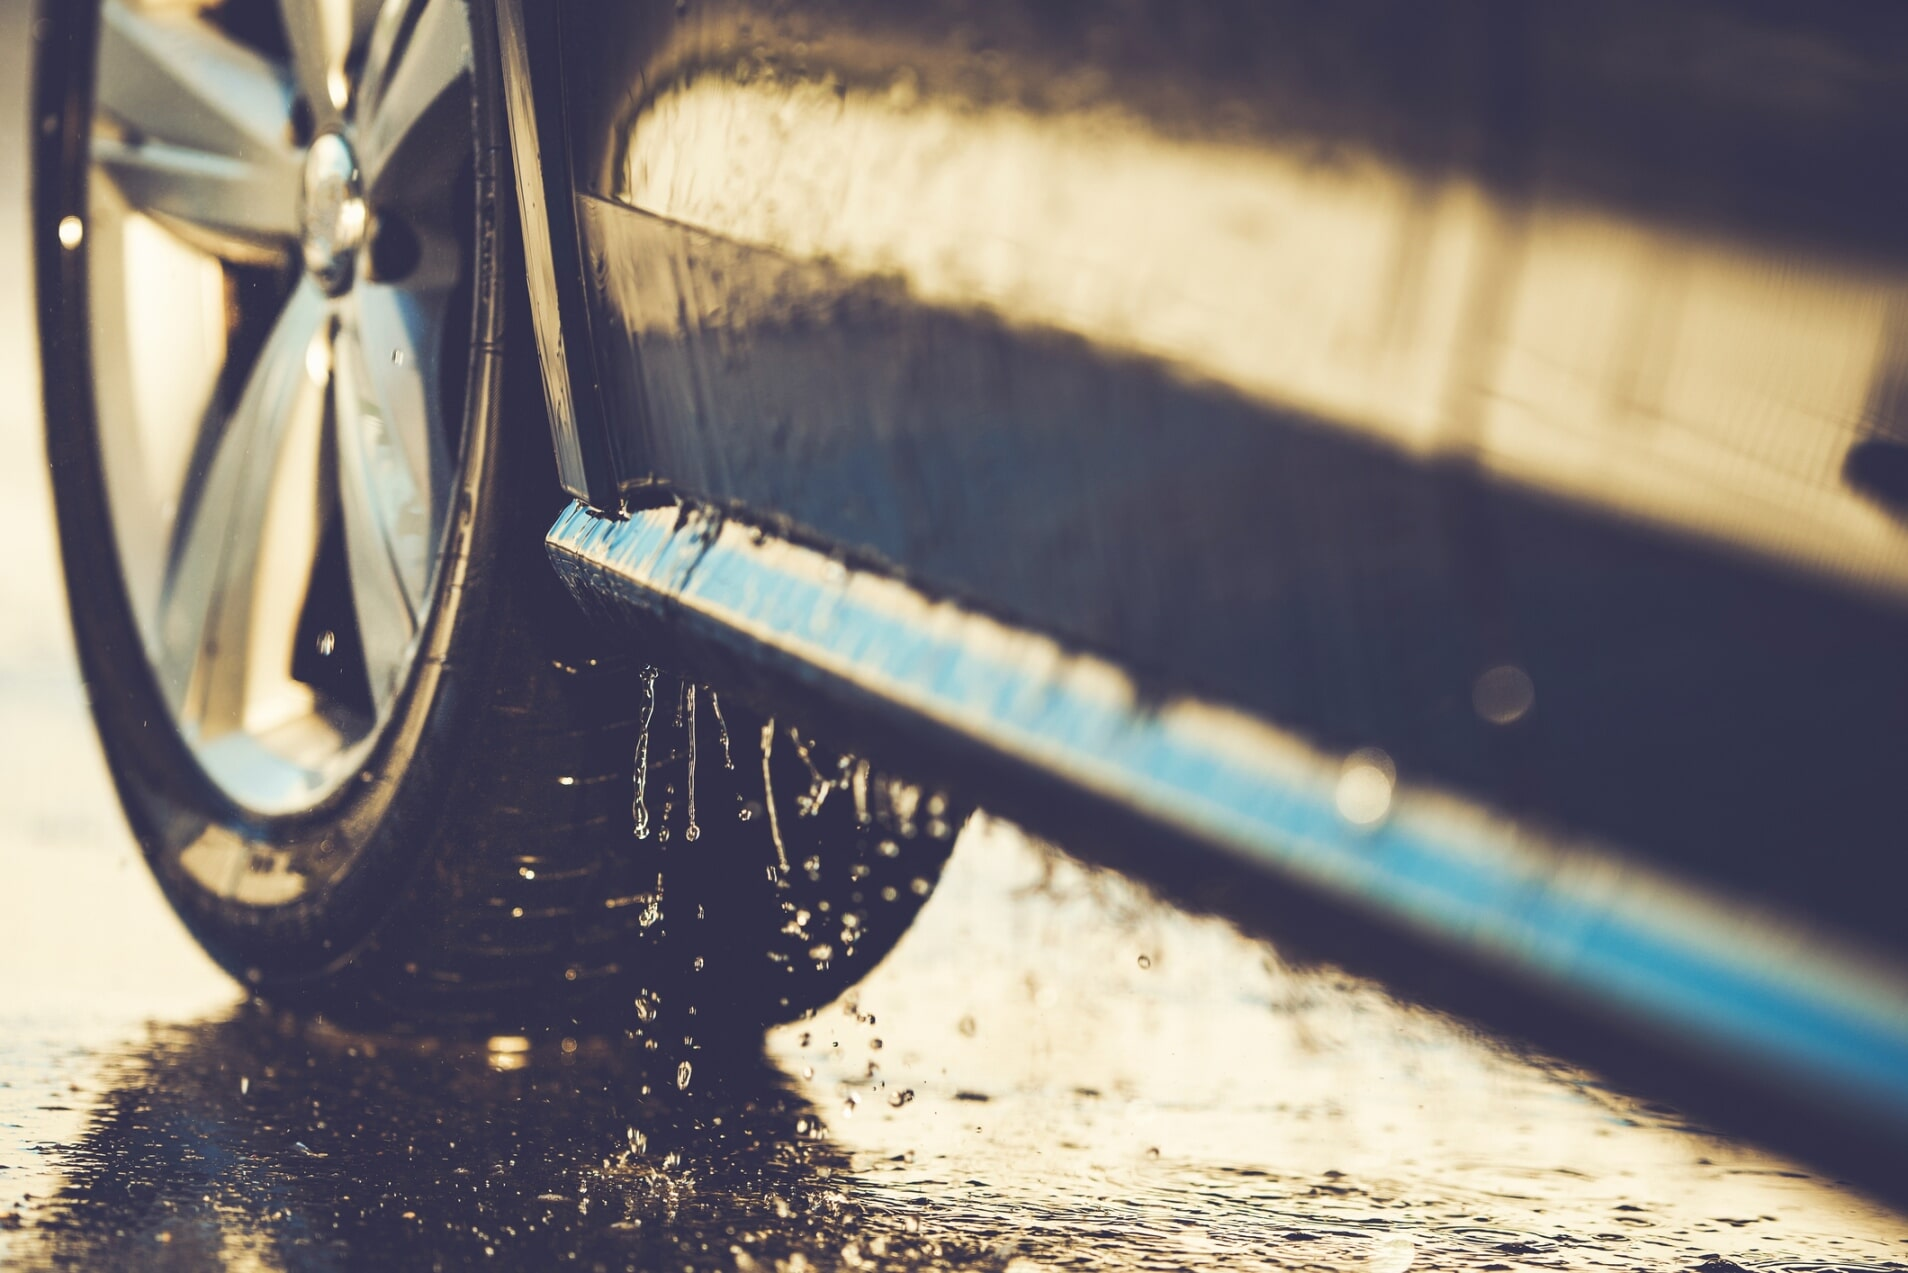 Car wash lakewood co buckys car wash car washing with blue sponge car wash in lakewood co solutioingenieria Gallery